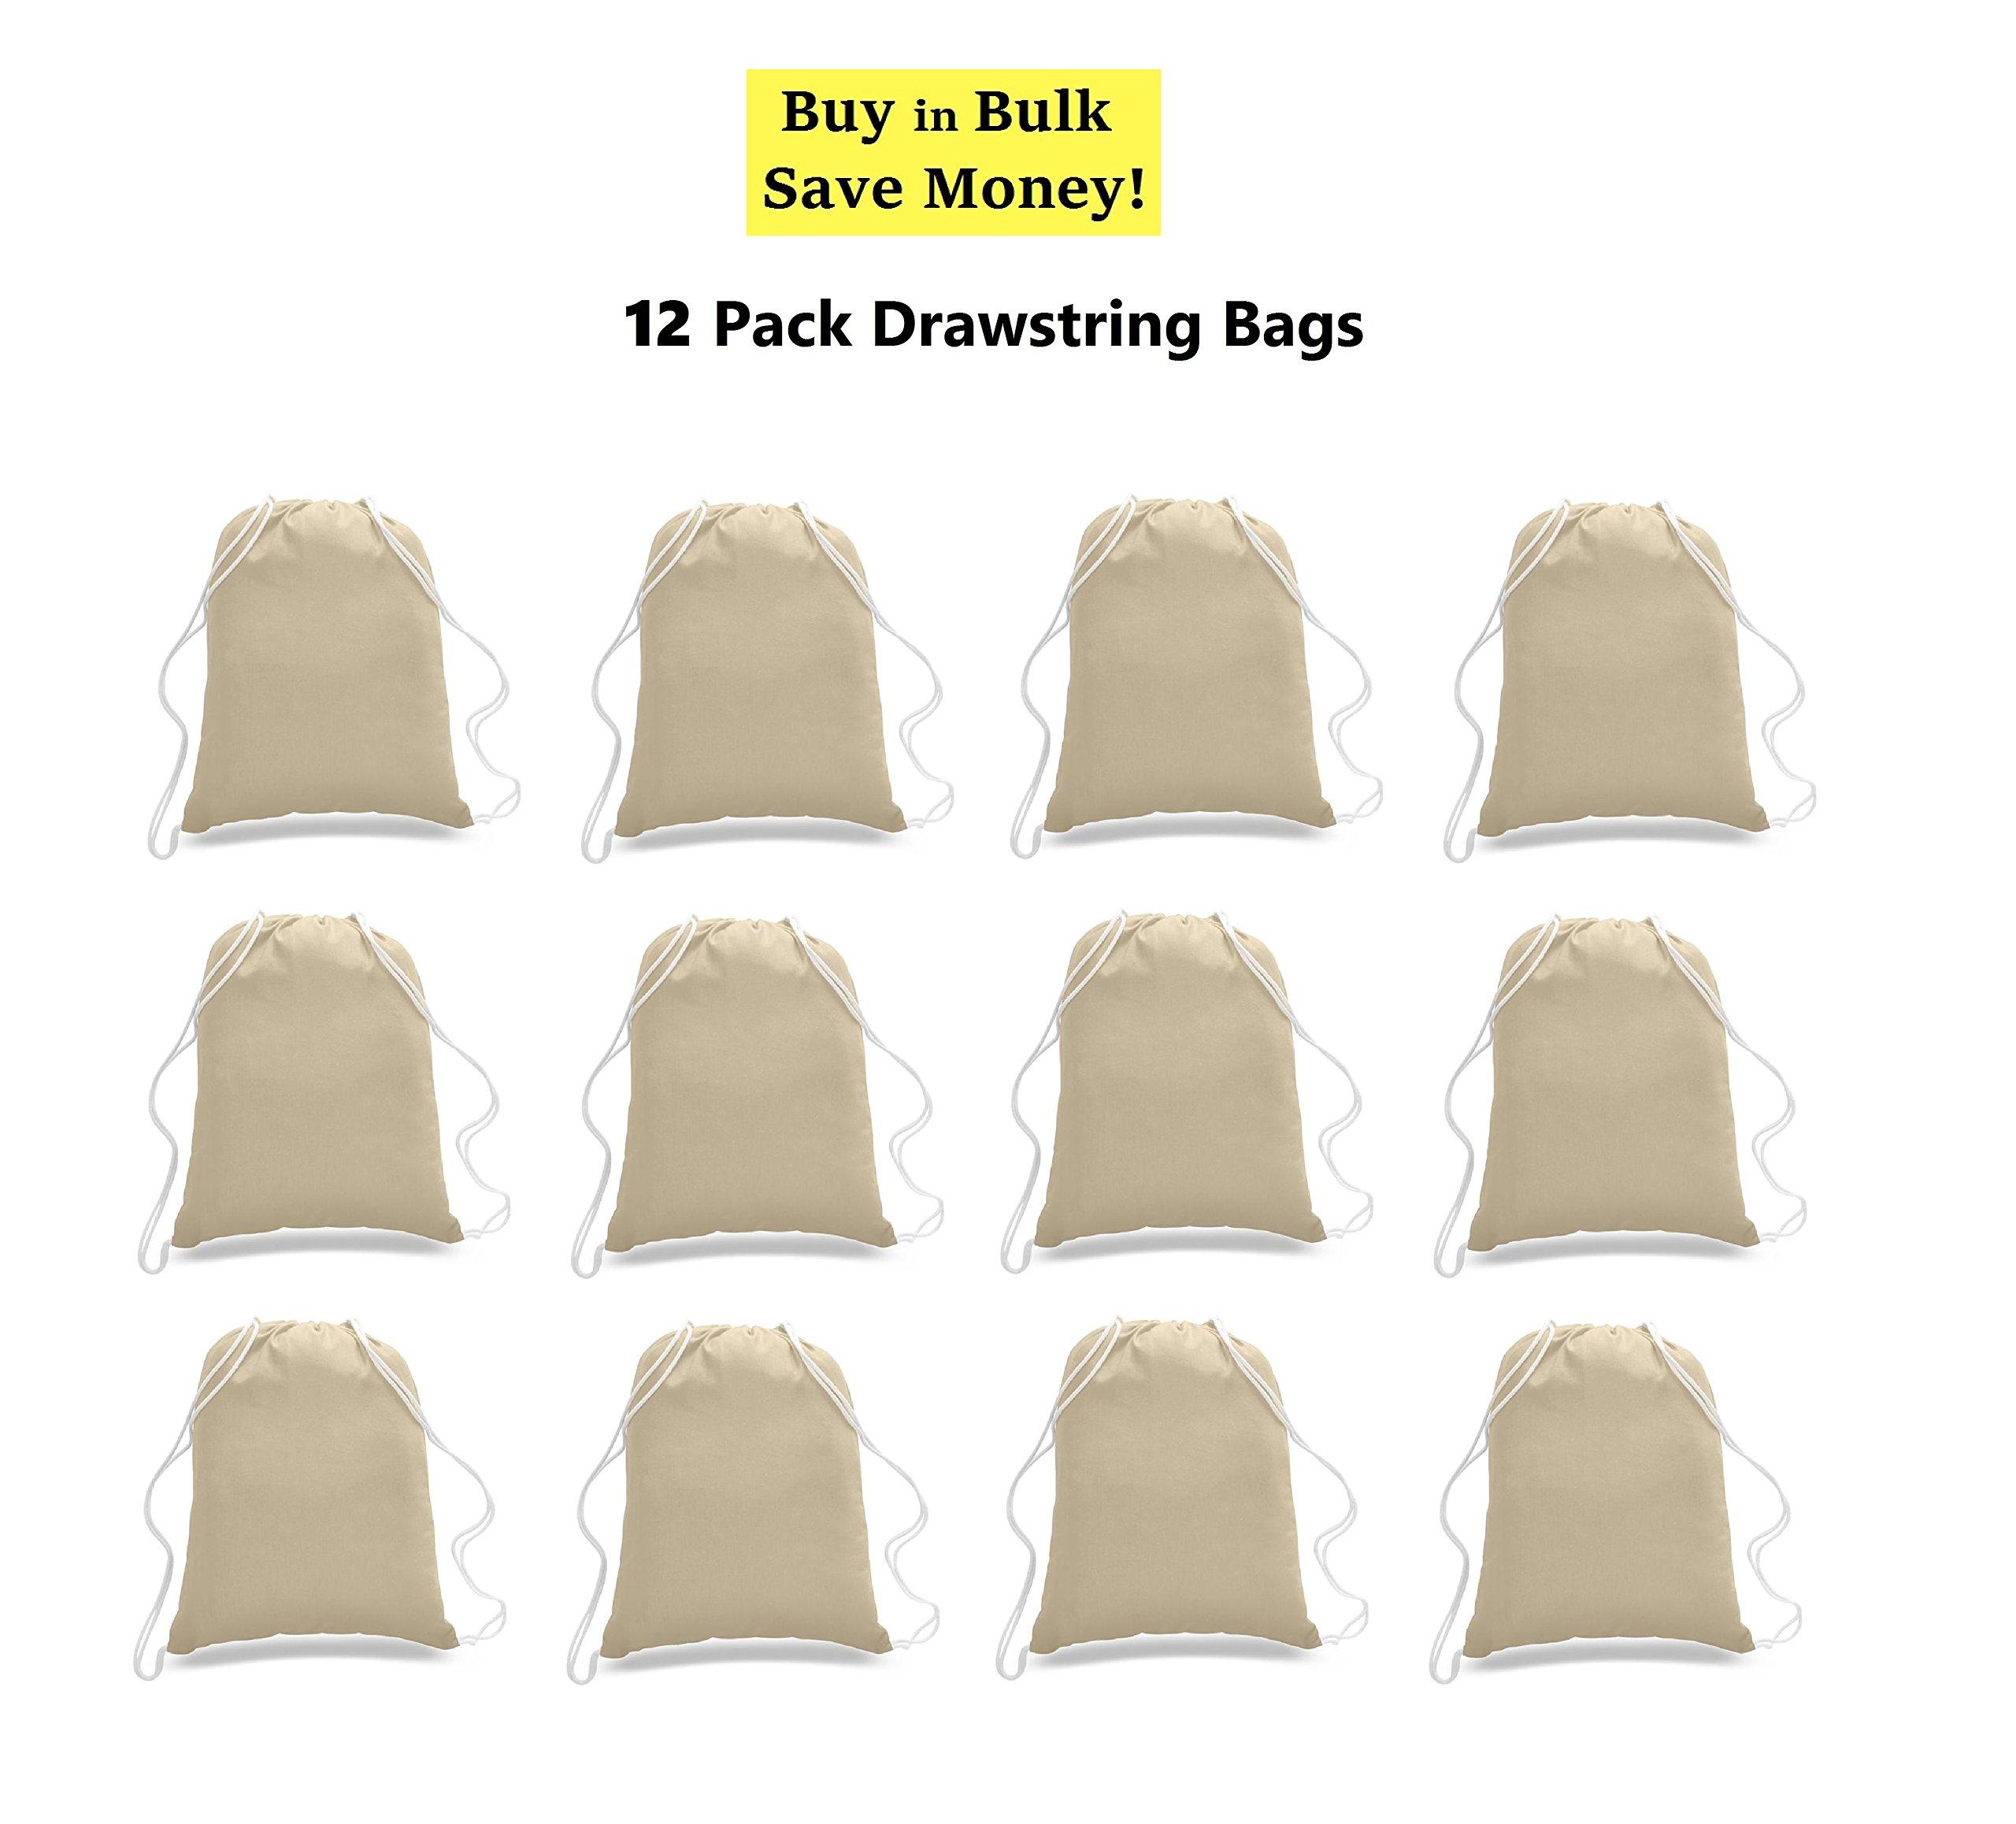 Great Deal! (12 Pack) 1 DOZEN Budget Friendly Sport Drawstring Backpack%100 Cotton Bags for Sport,Gym or Promotional Plain Backpacks (NATURAL)